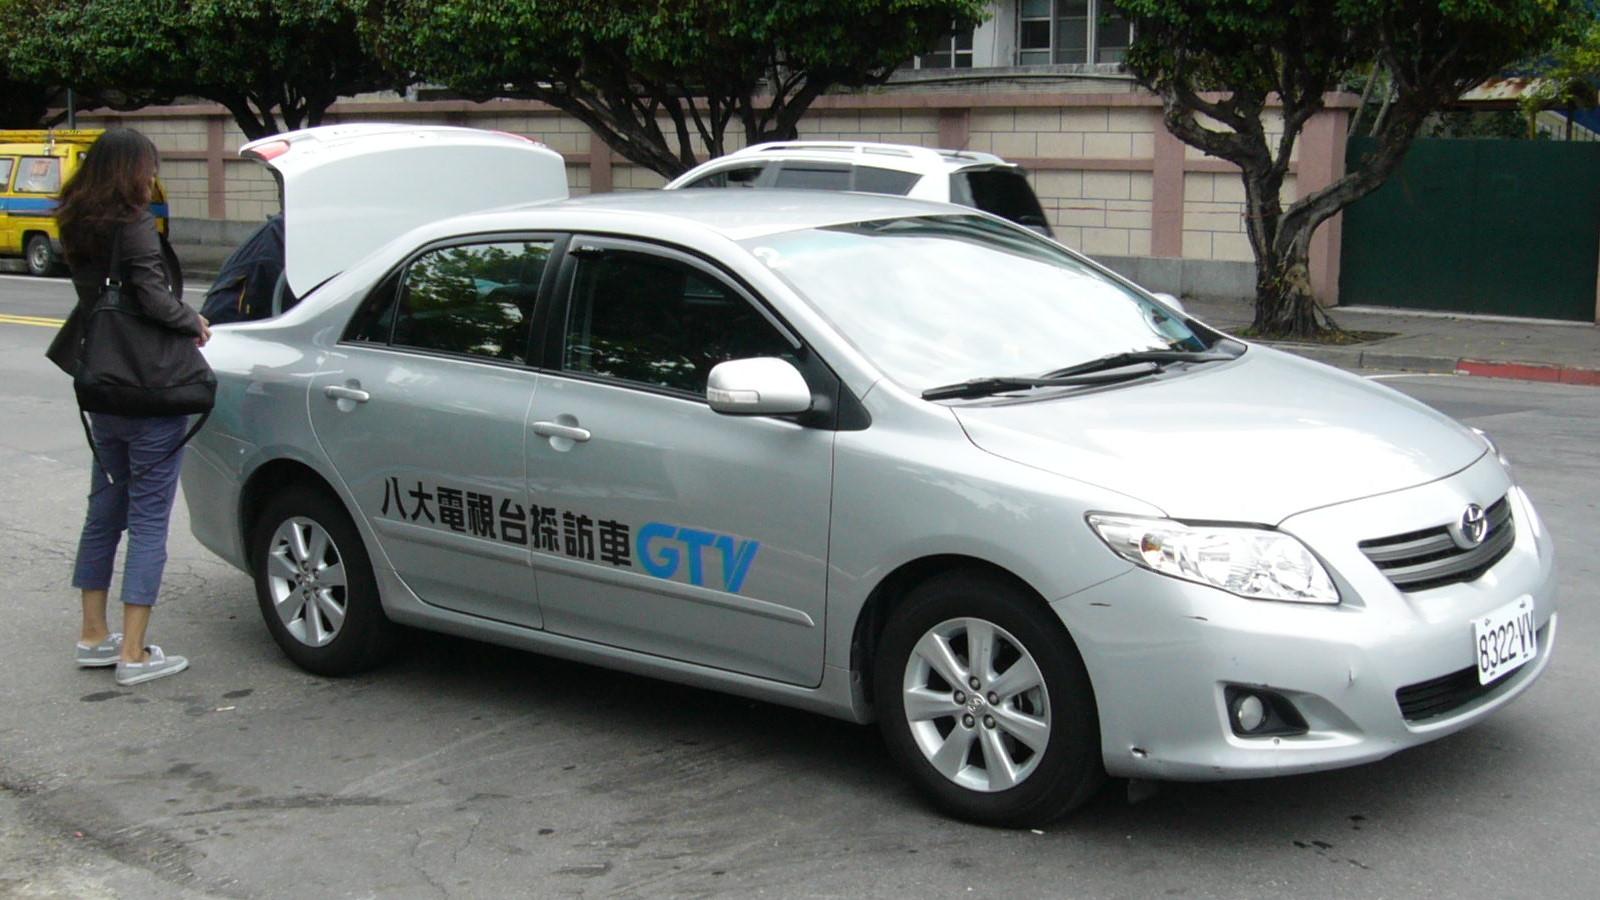 file:gala tv news car 8322-vv 20101010 - wikimedia commons